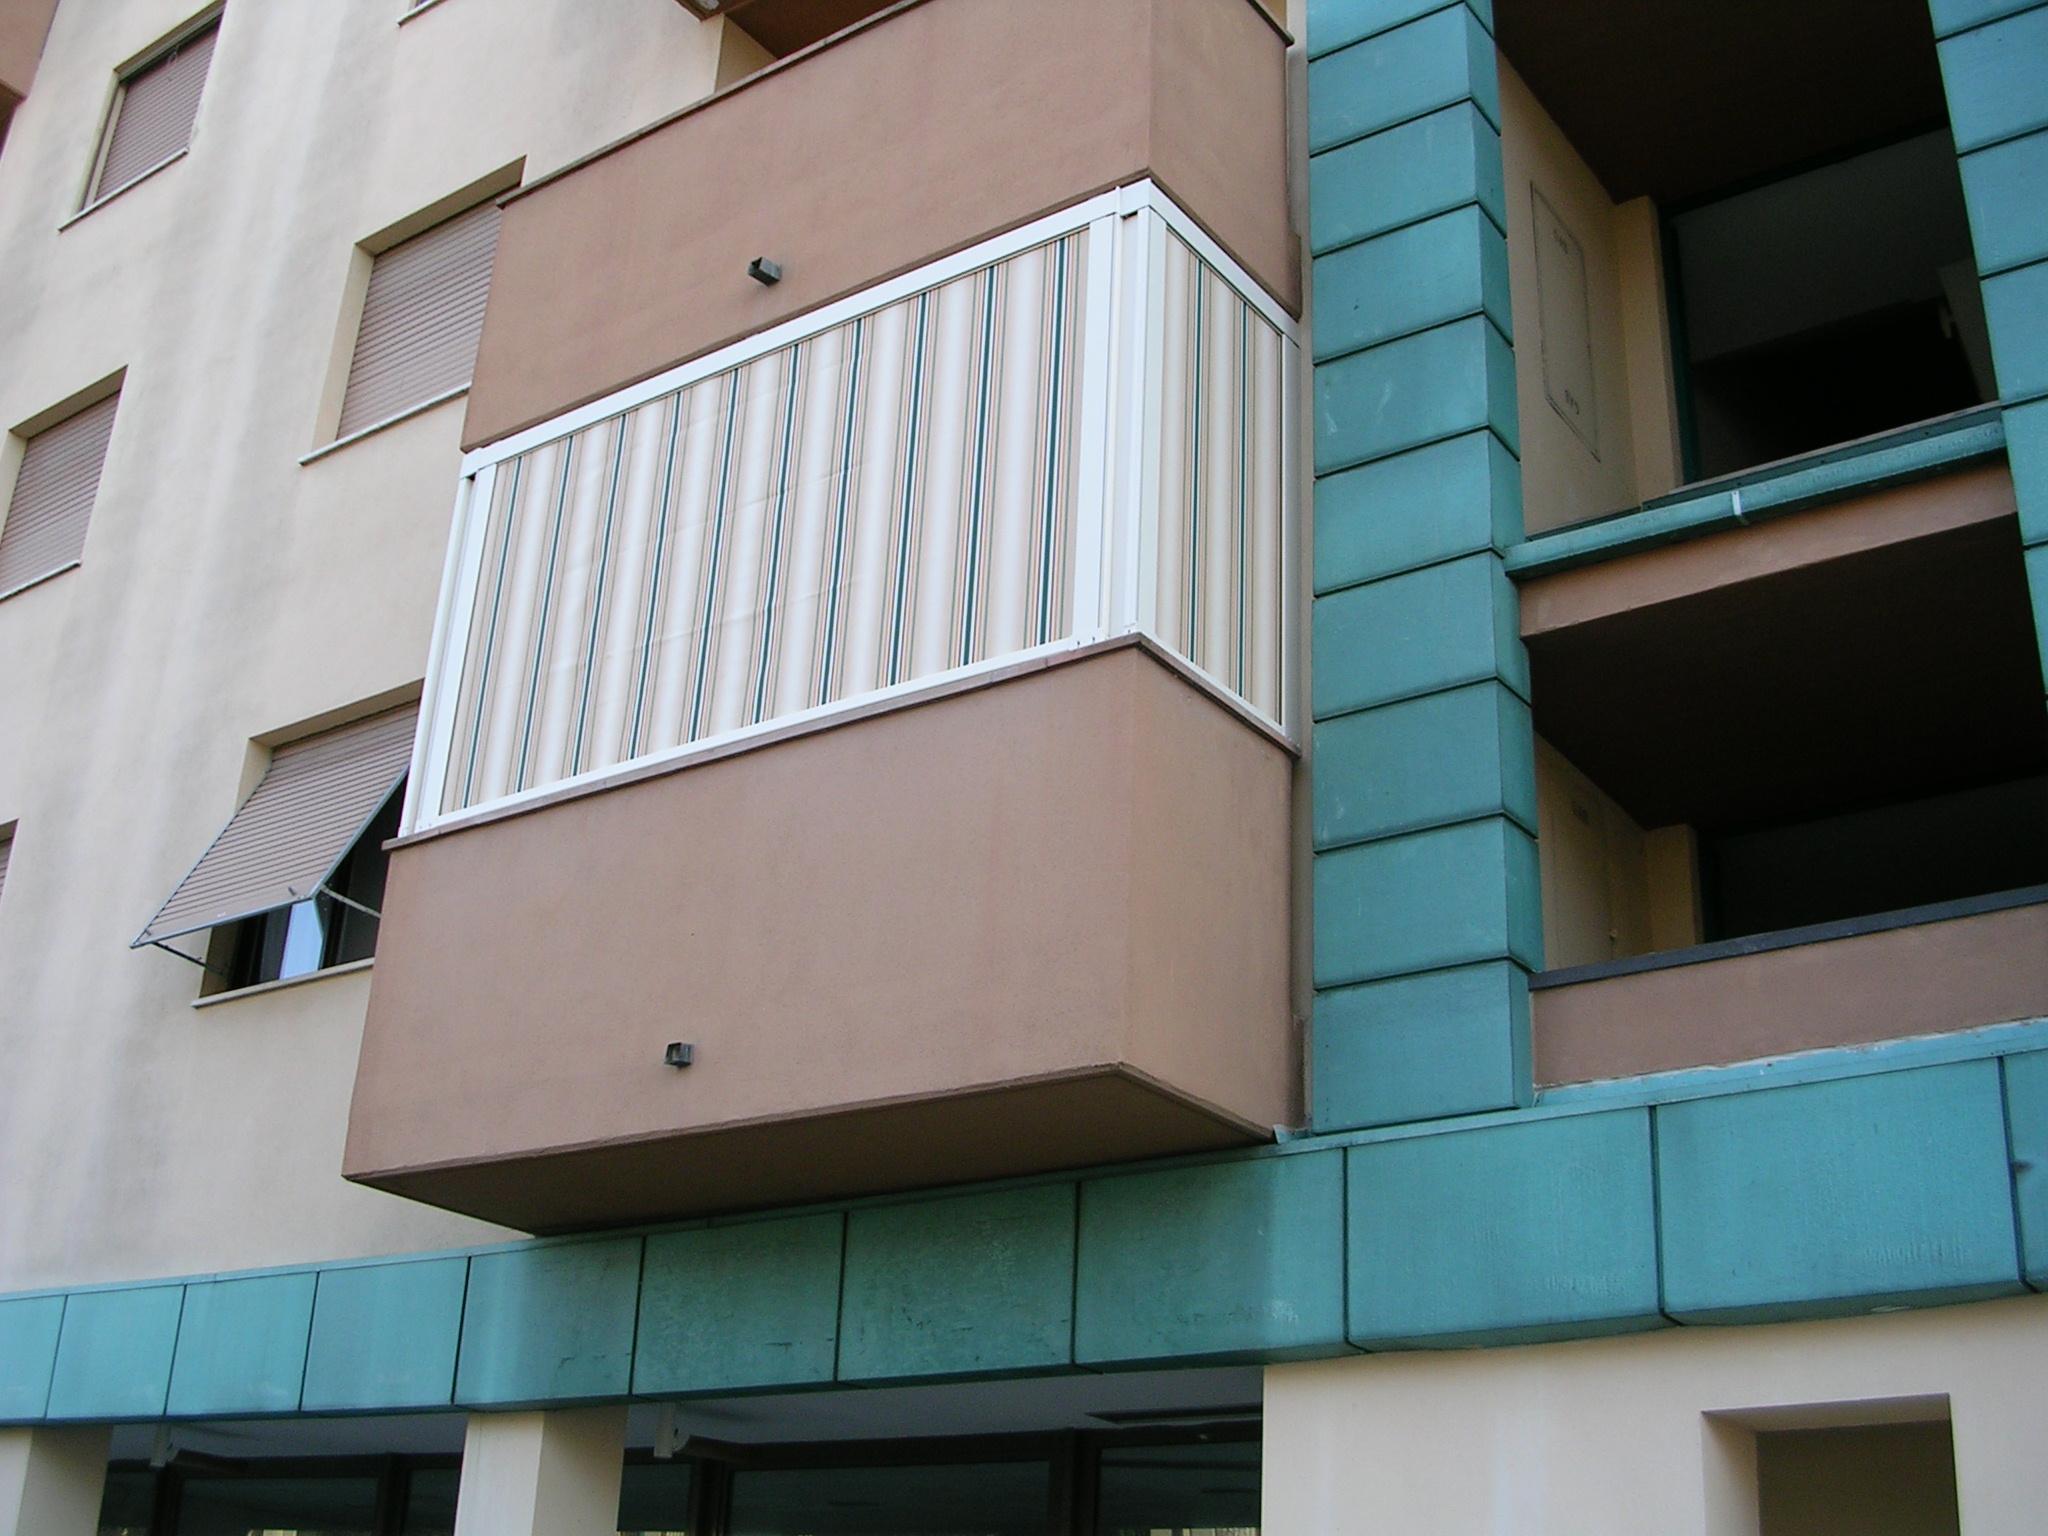 Tende Veranda Estate Inverno : Tende a veranda tende veranda